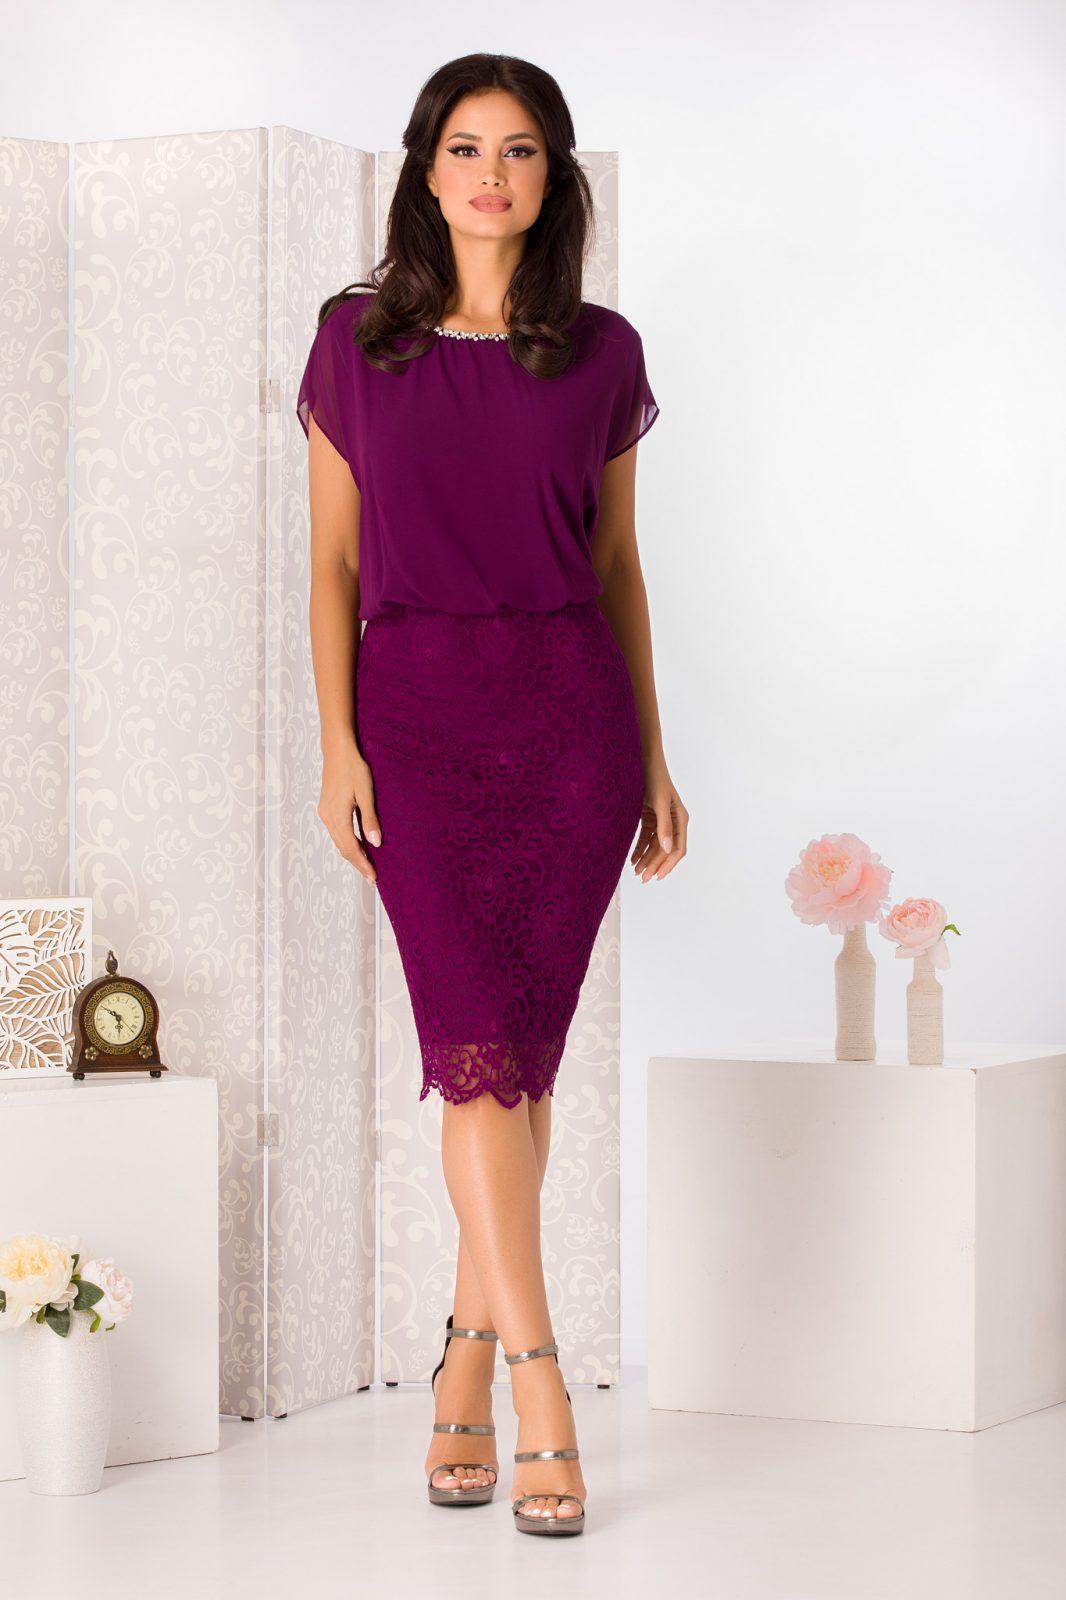 Trisha Violet Dress